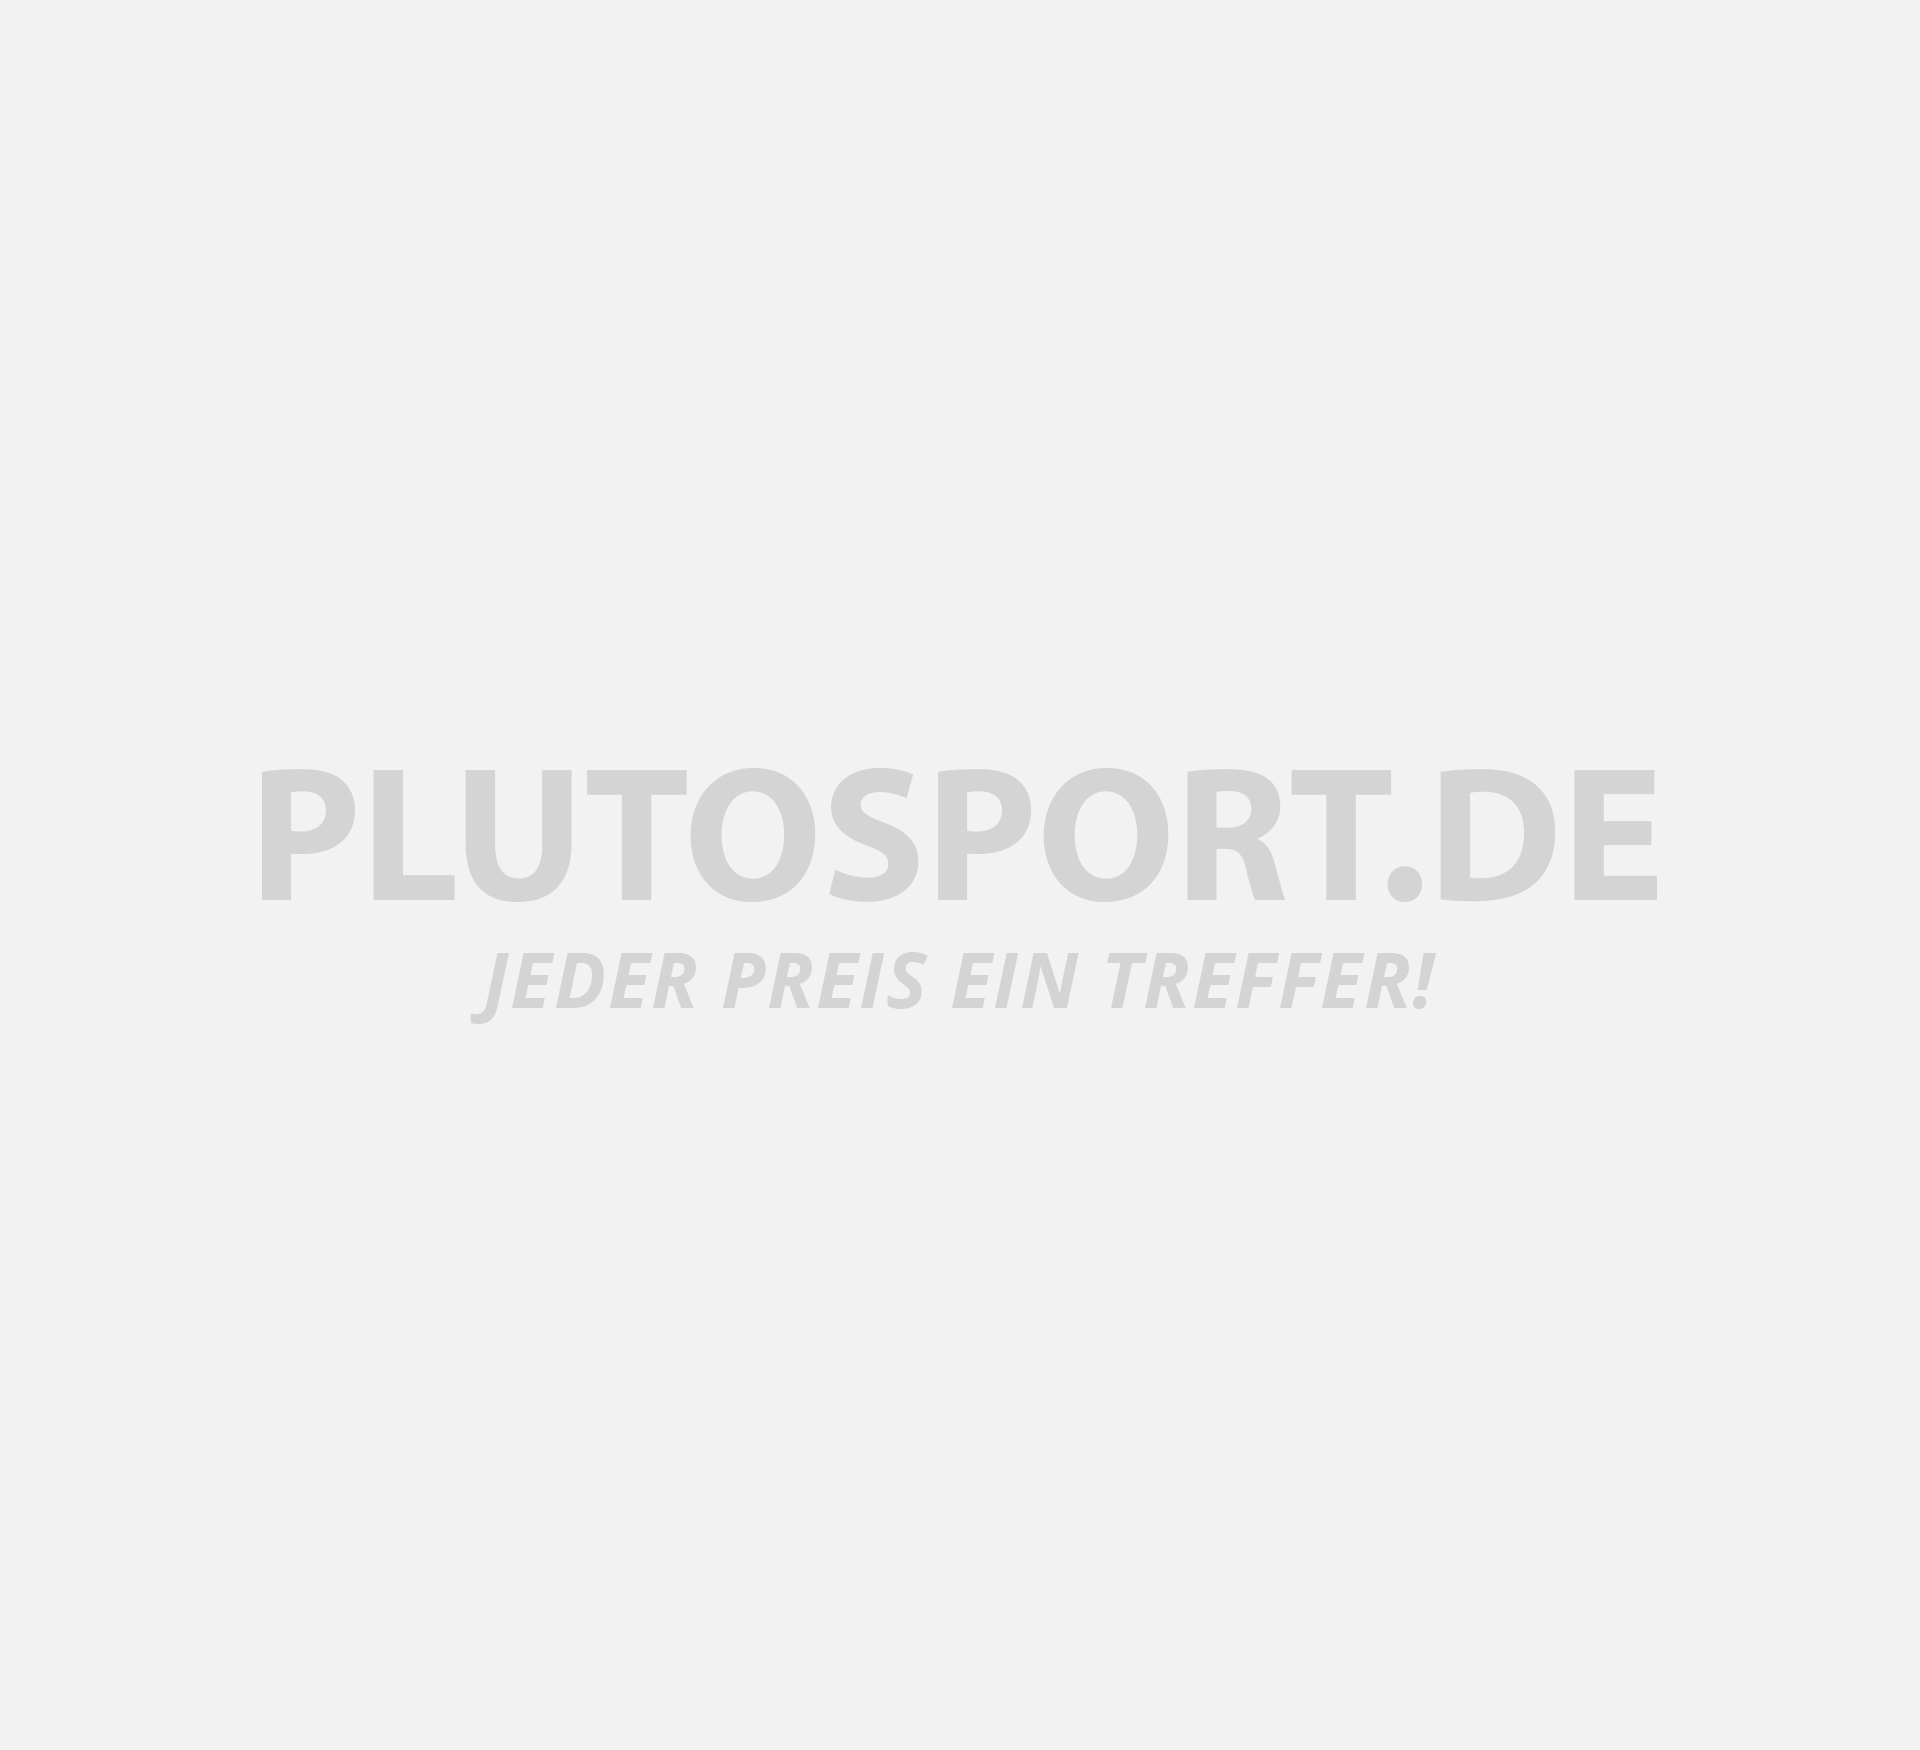 Aqua Lung Duetto LX + Airflex Purge LX Schnorchel Set